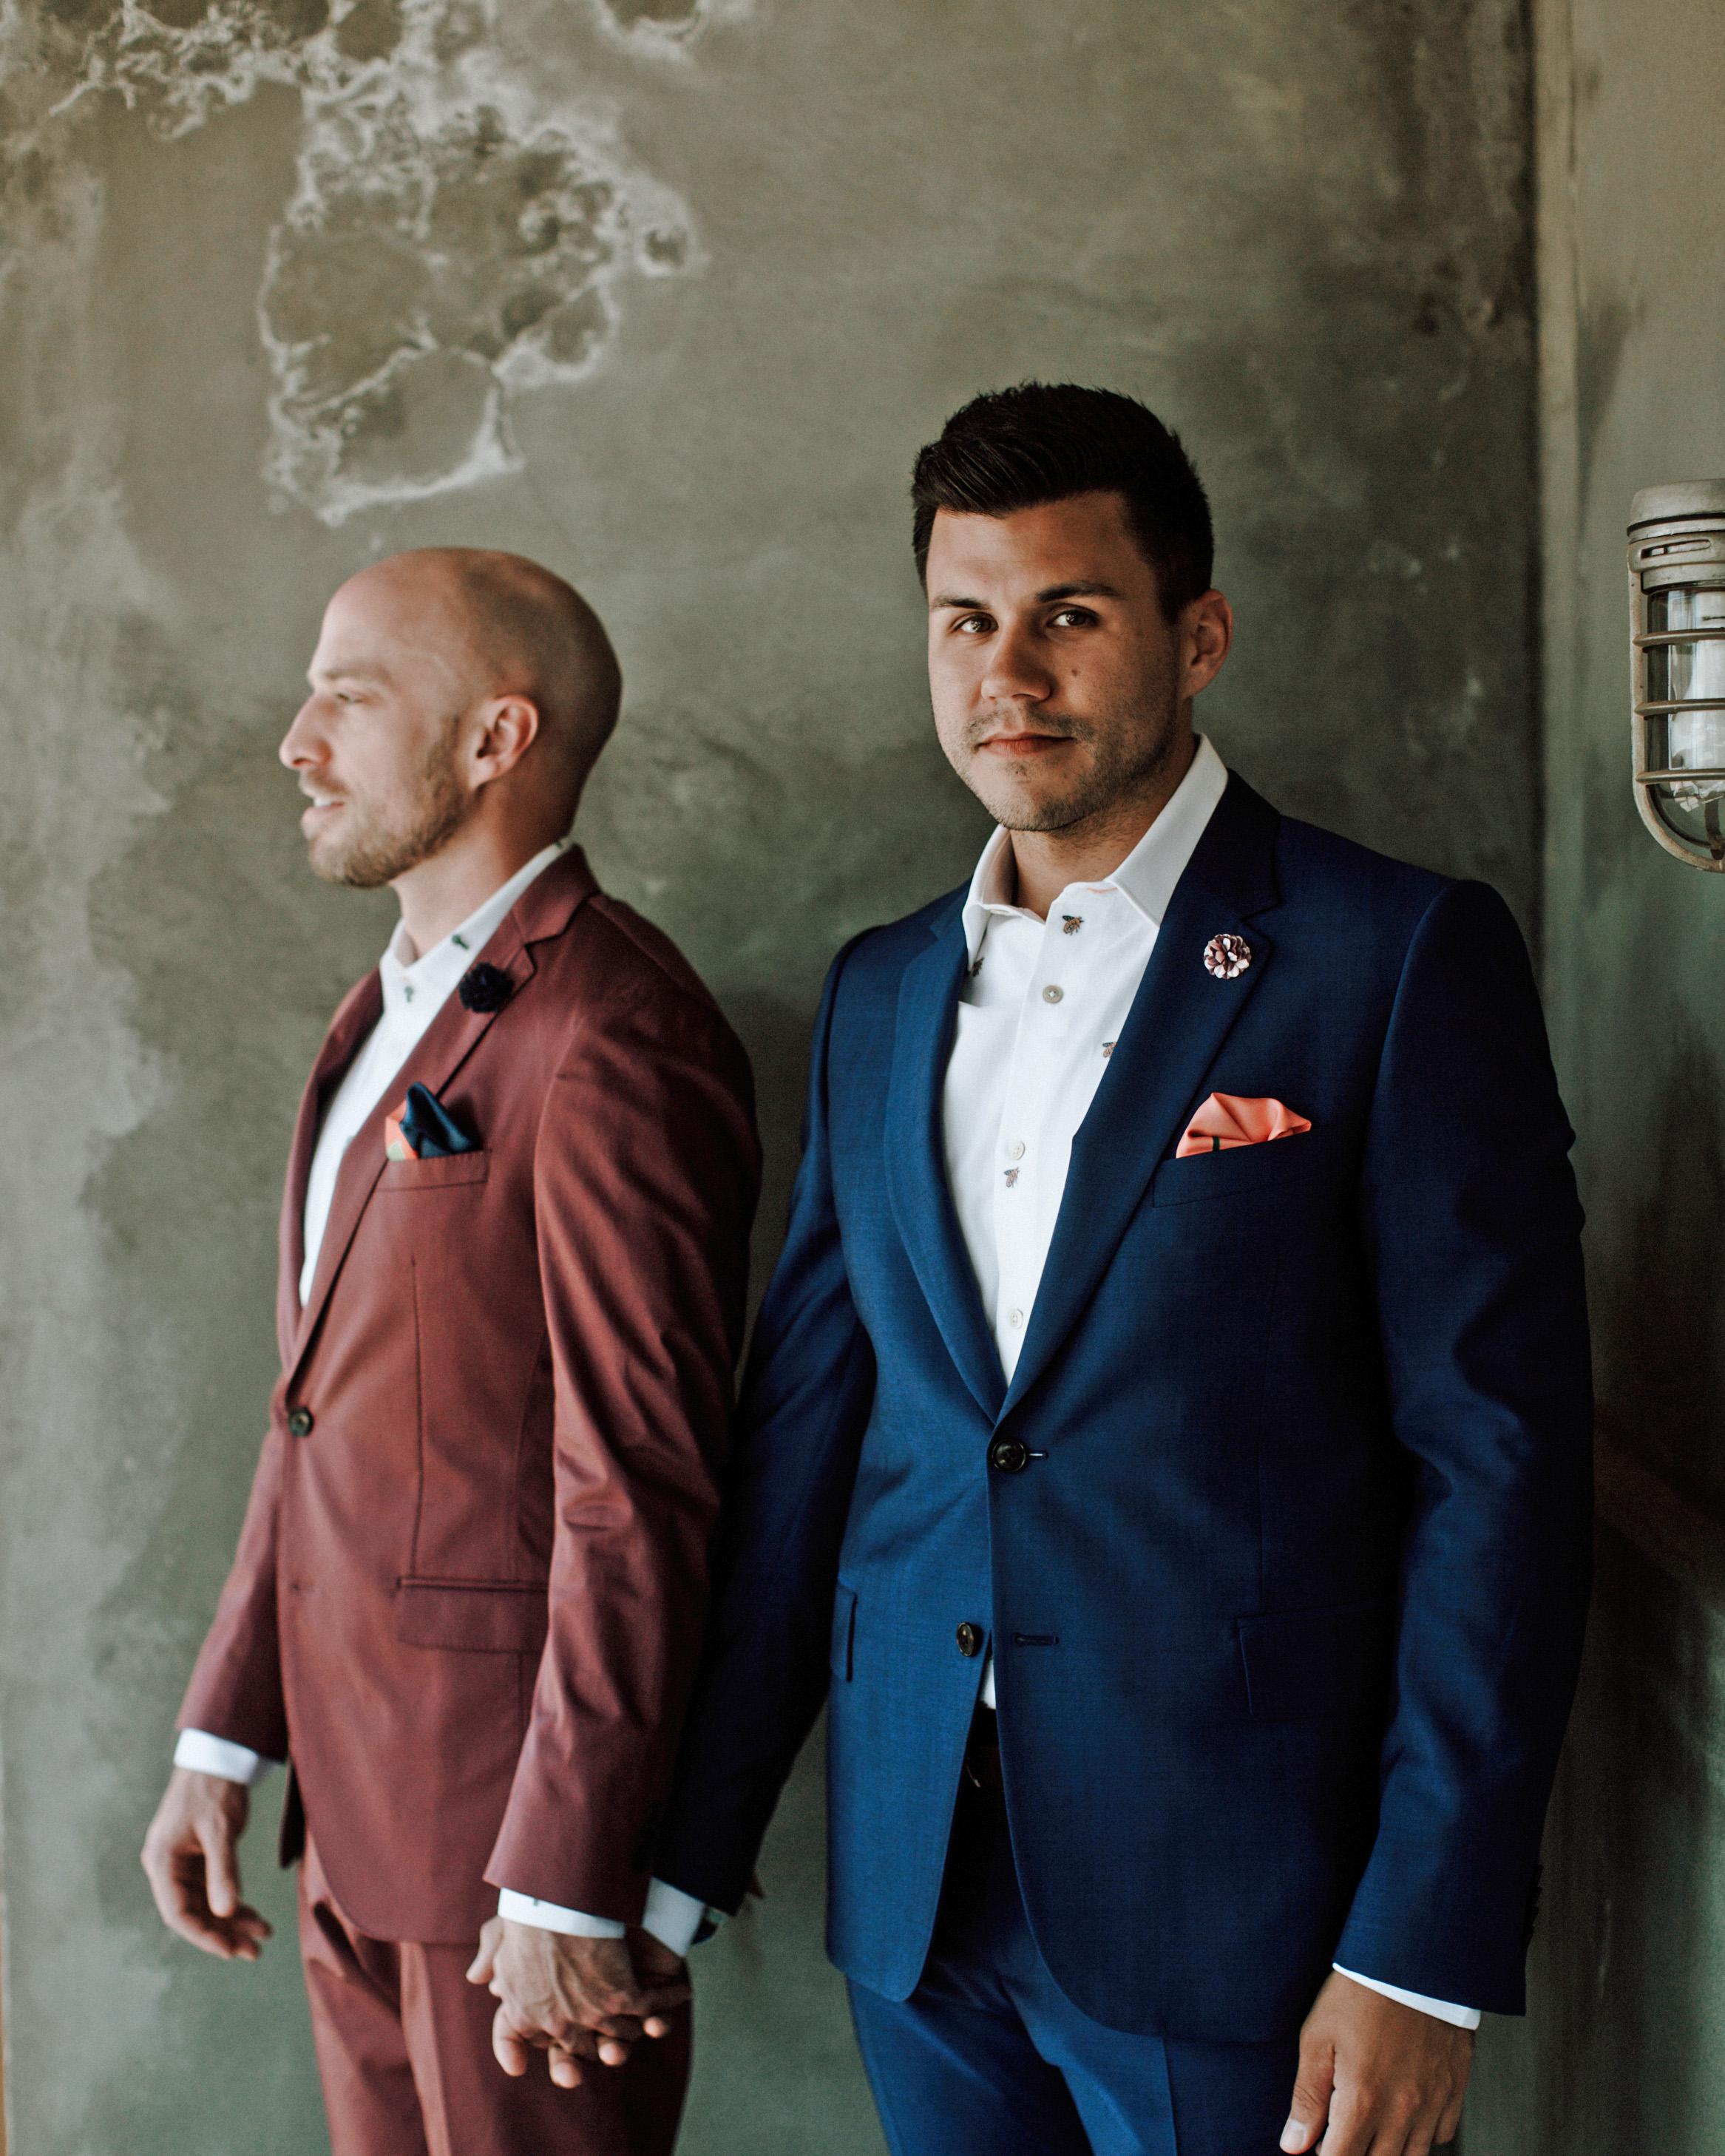 colorful wedding suits joseph west